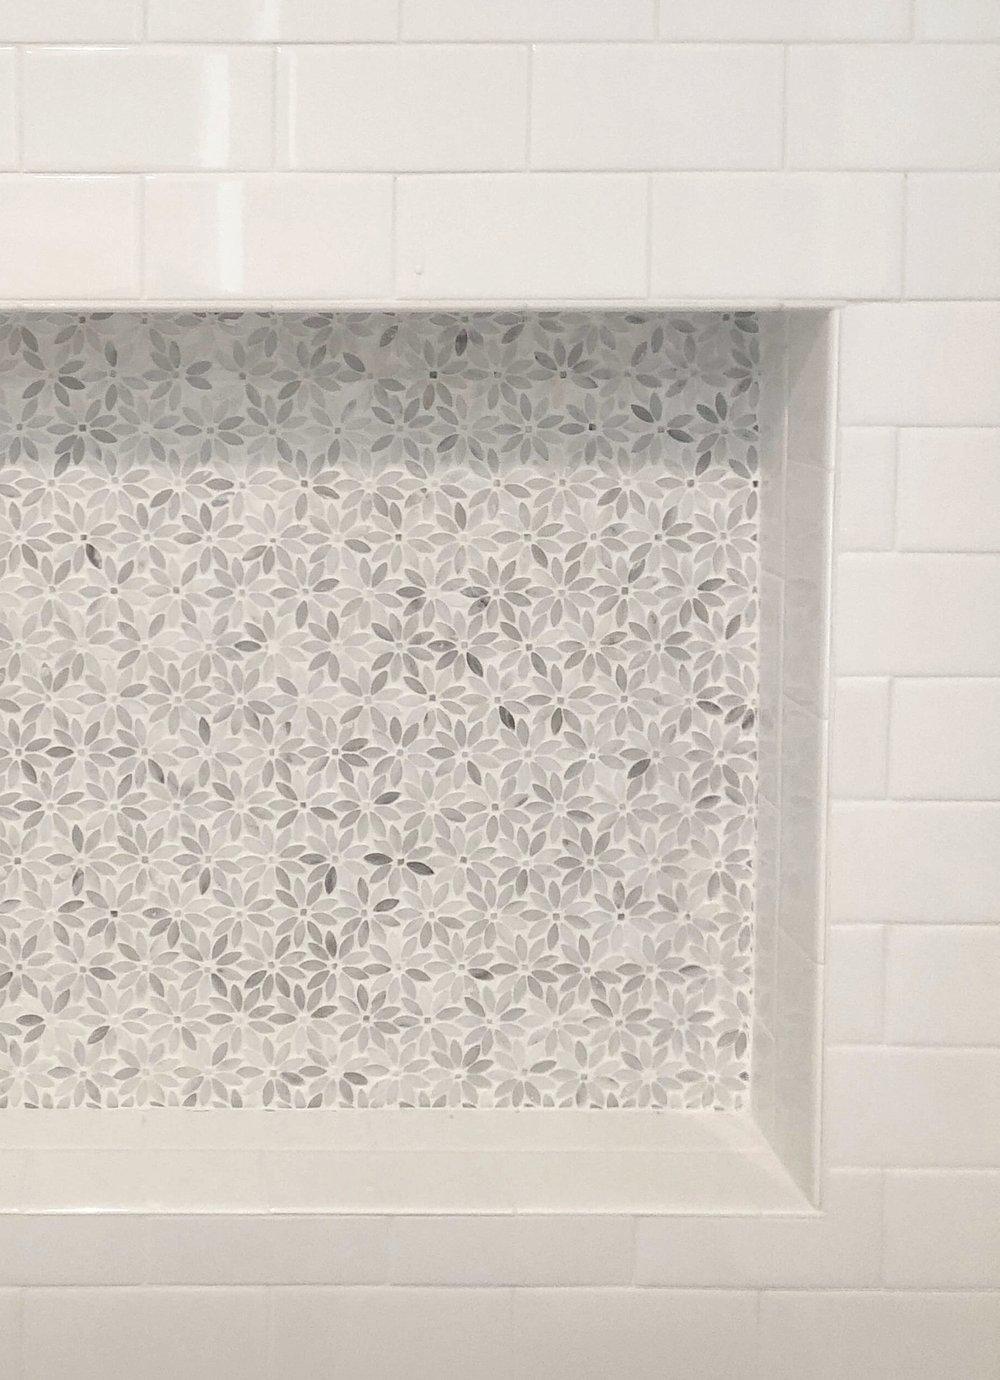 Shampoo niche with flower pattern tile